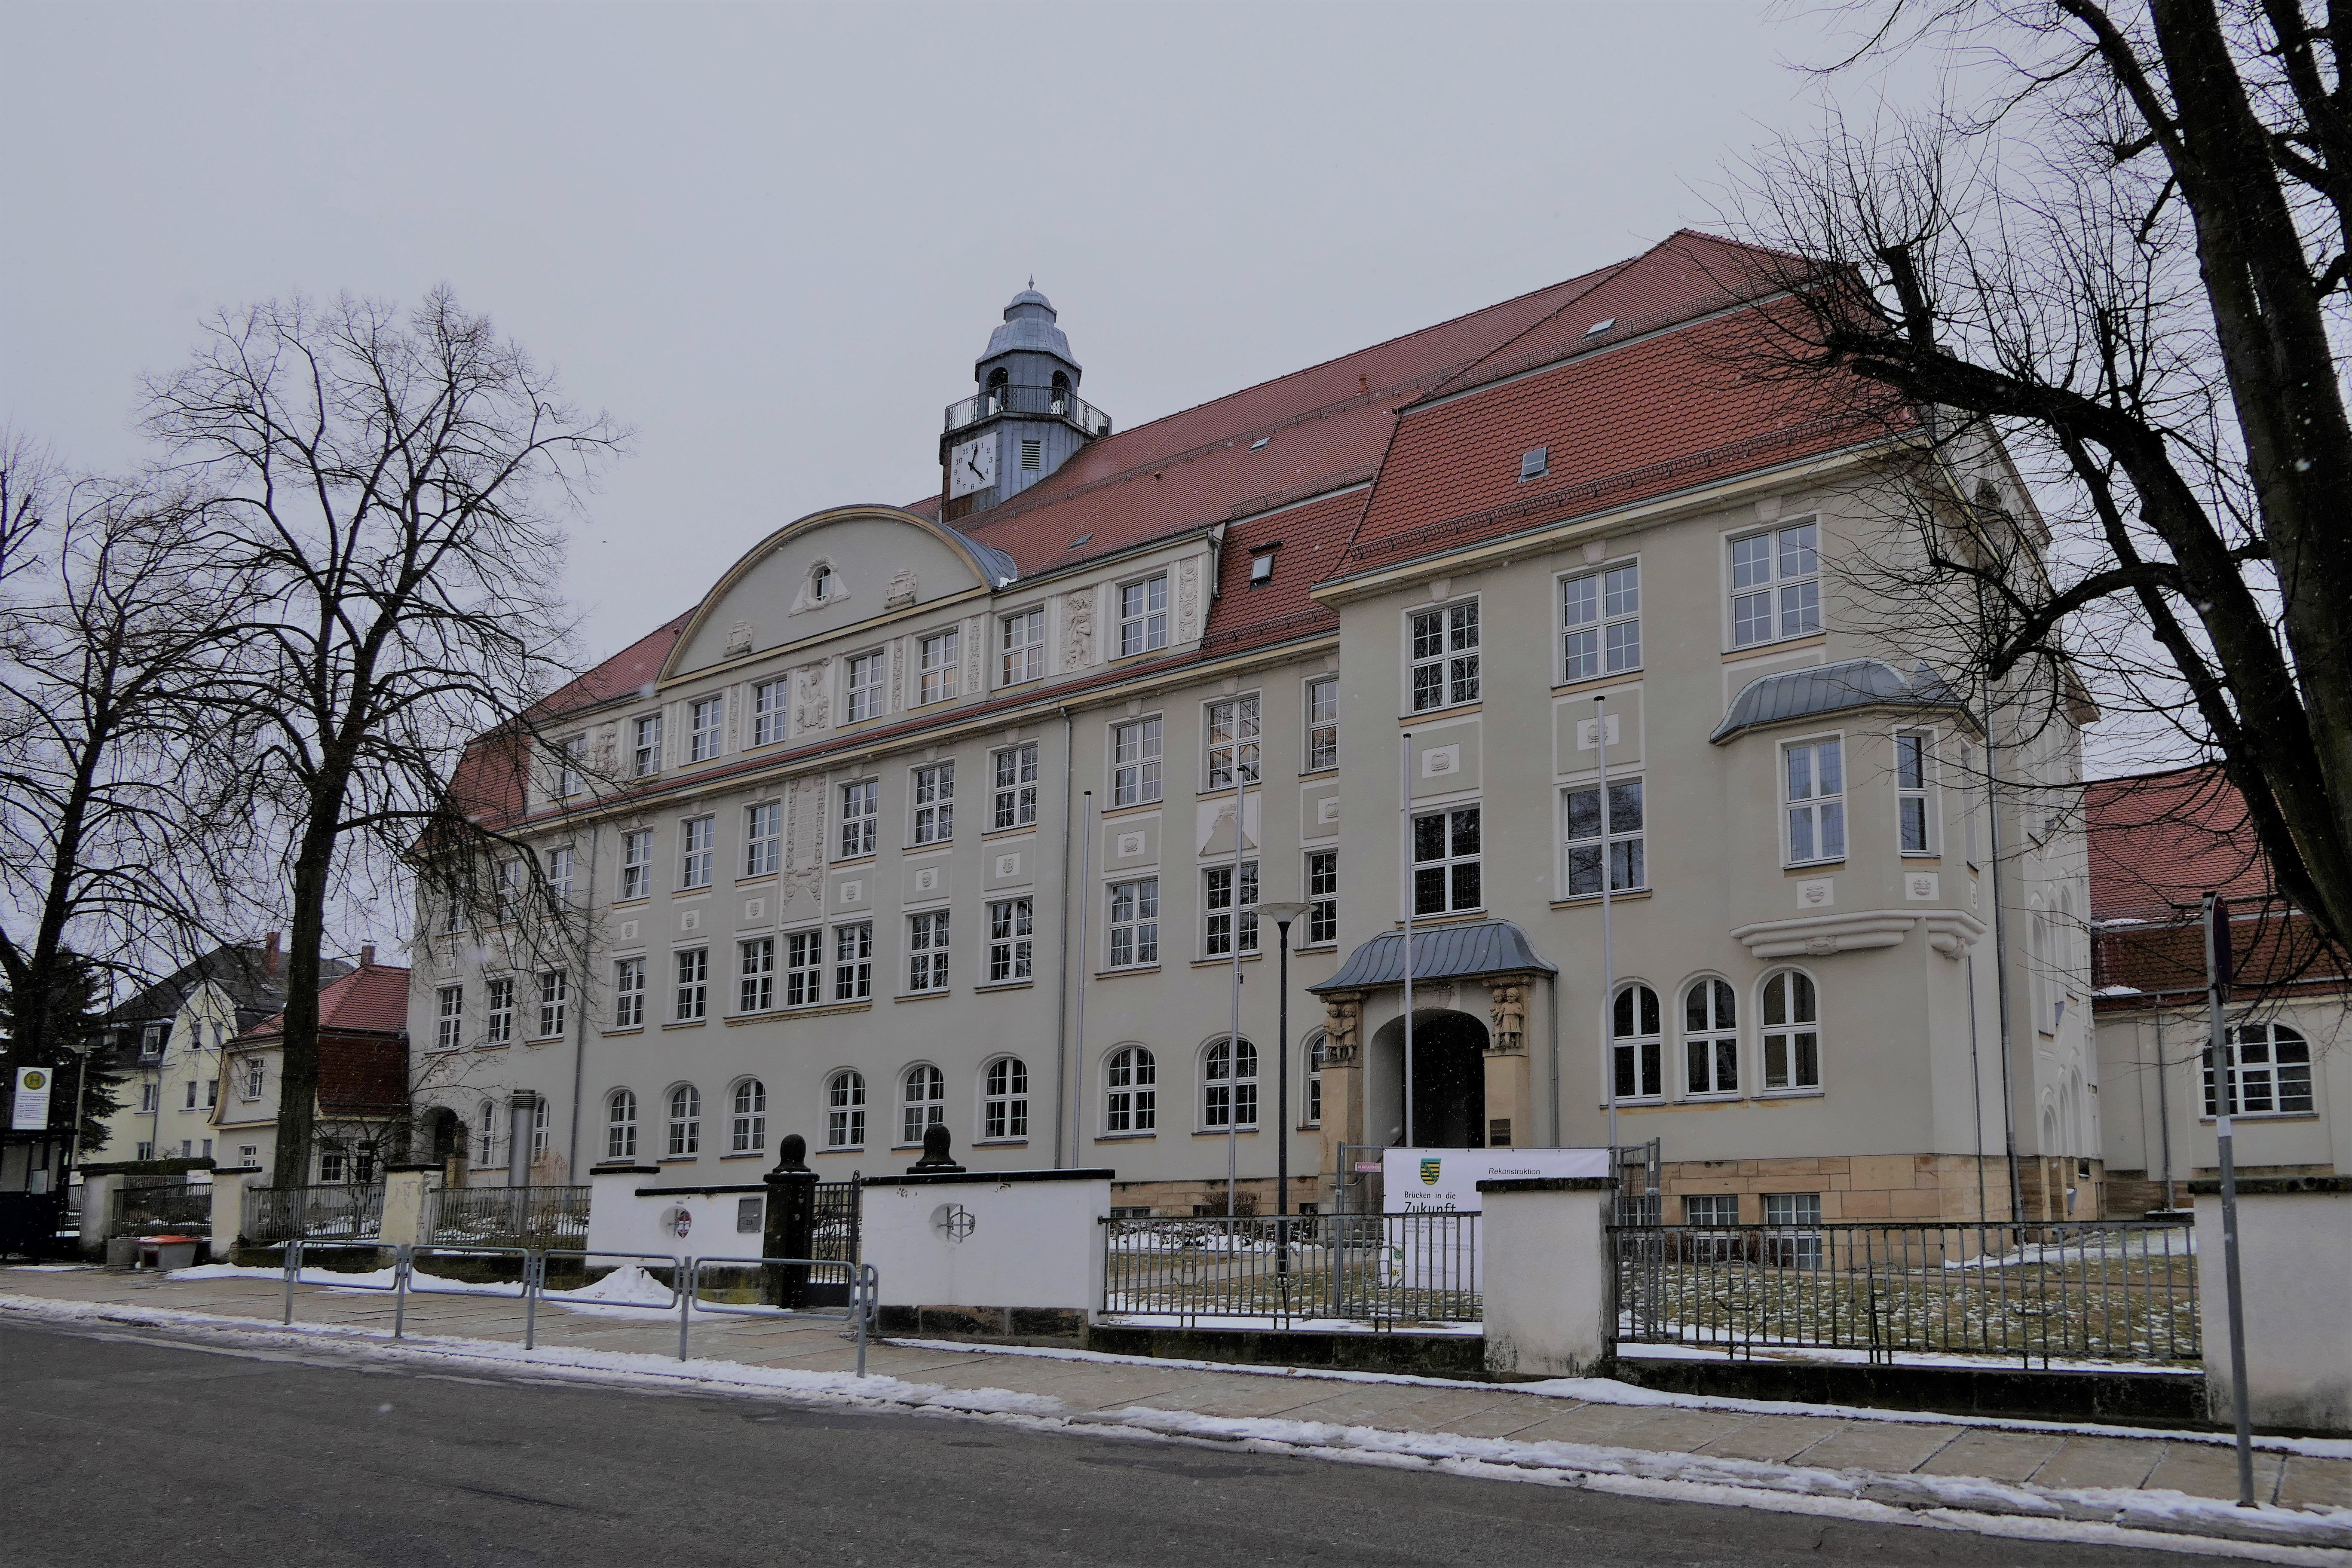 Liste der Kulturdenkmale in Limbach-Oberfrohna - Wikiwand